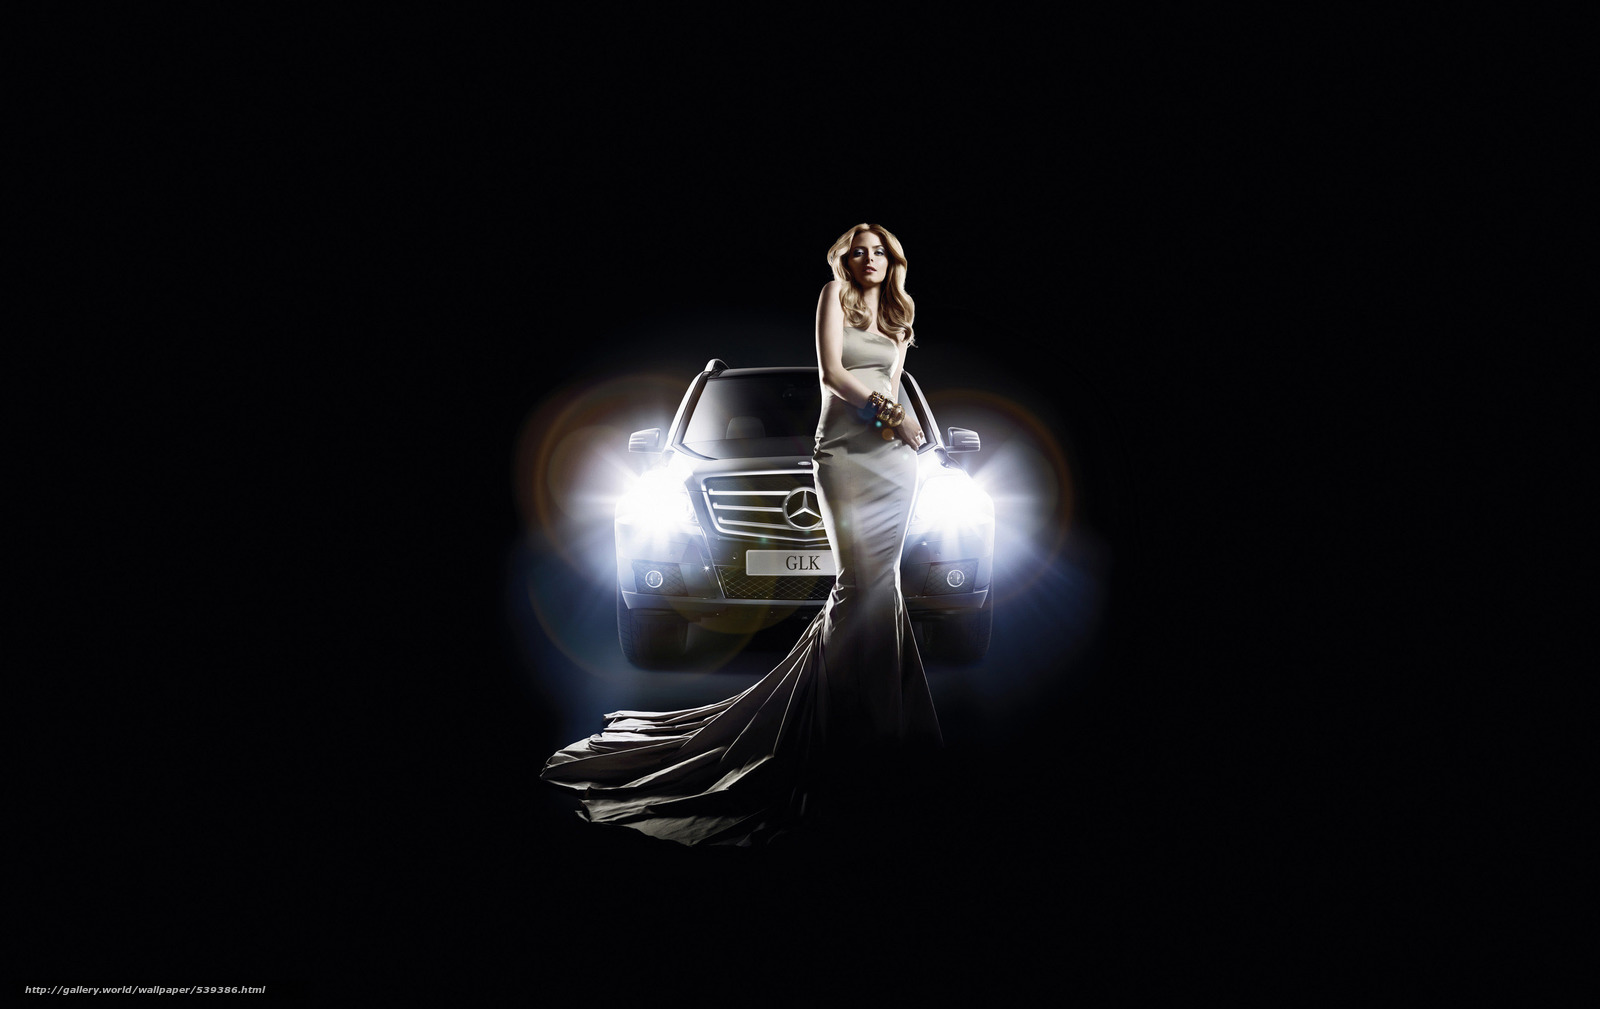 Скачать на телефон обои фото картинку на тему Eva Padberg, Mercedes-benz, GLK, fashion, разширение 3000x1892